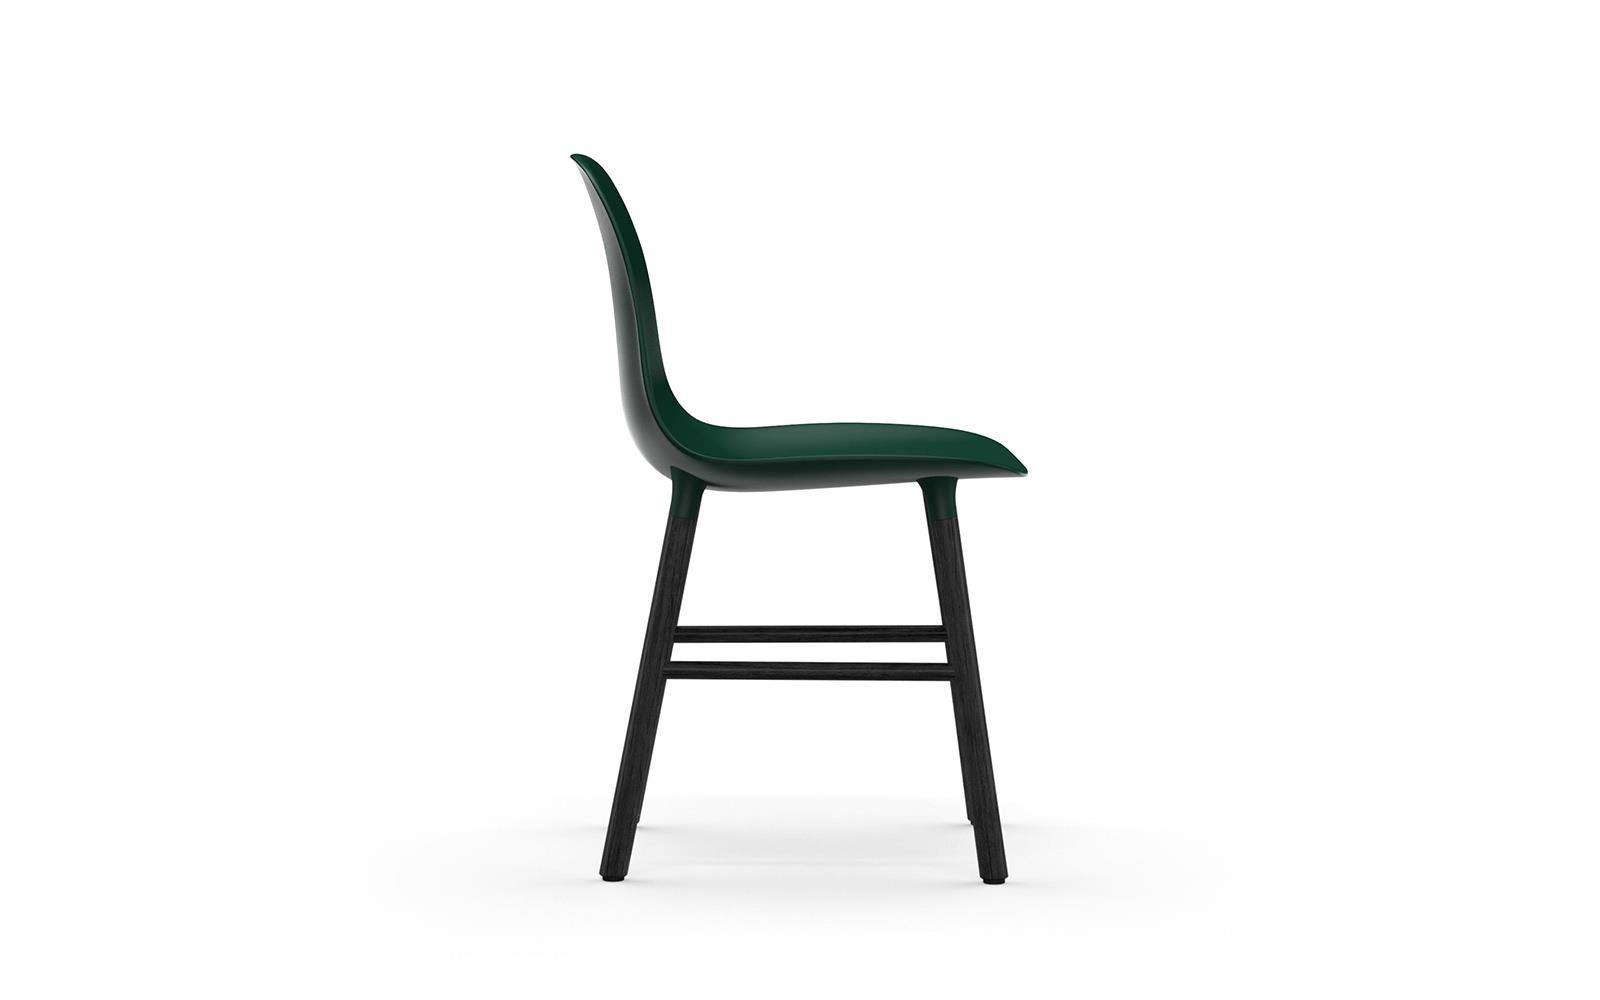 Form Stuhl